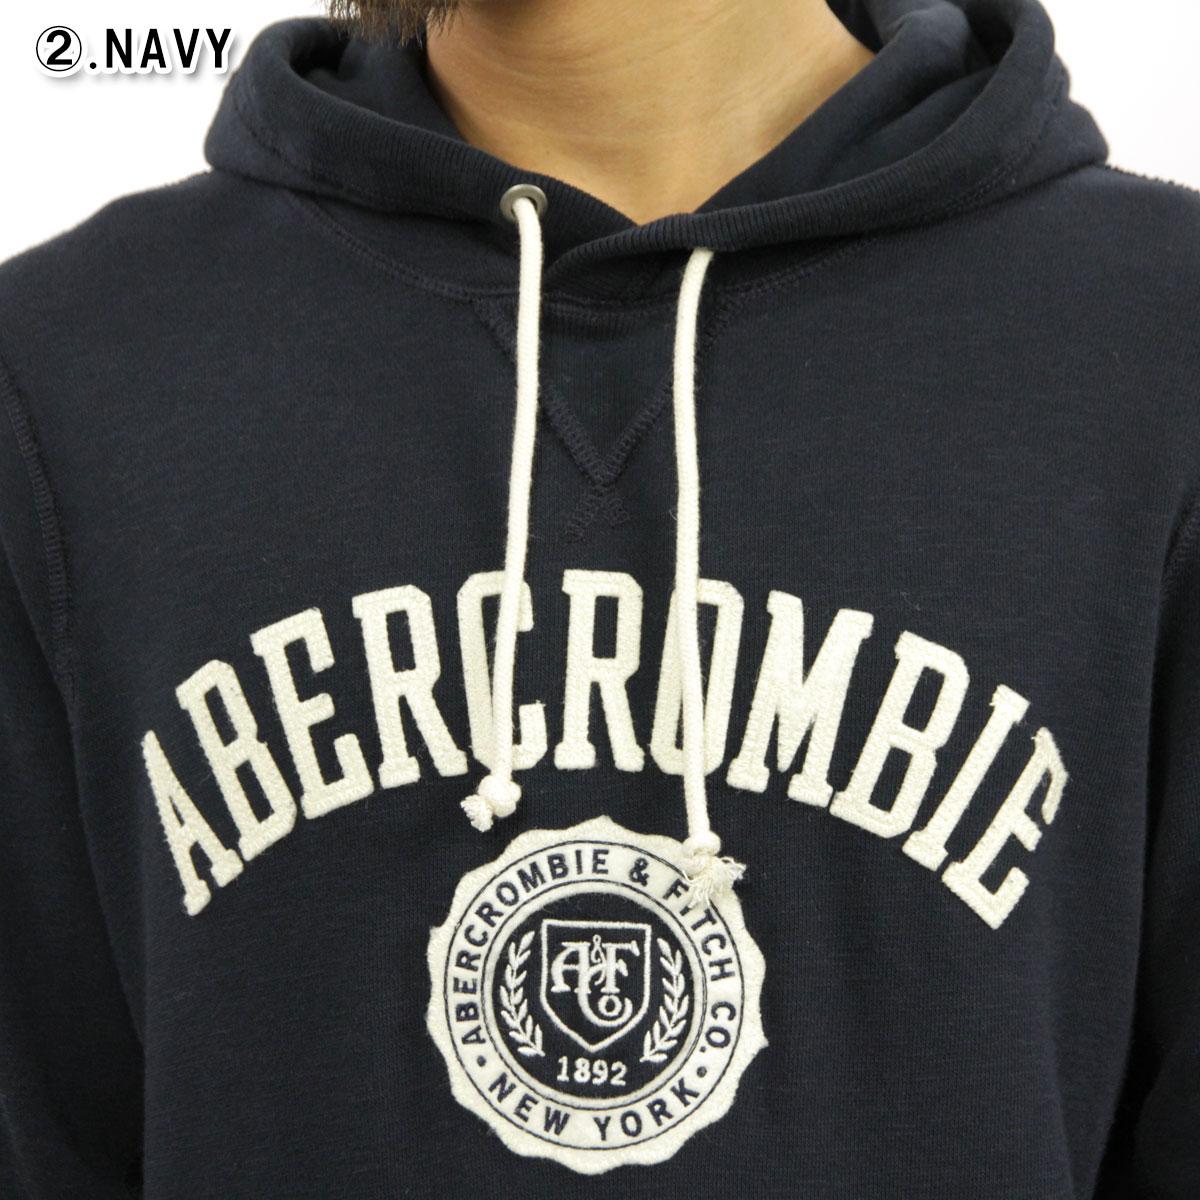 Combie Sweater Hodie Daftar Harga Terlengkap Indonesia Jaket Fleece Misty Abba Black Abercrombie Fitch Regular Article Men Graphic Logo Pullover Parka Applique Hoodie 122